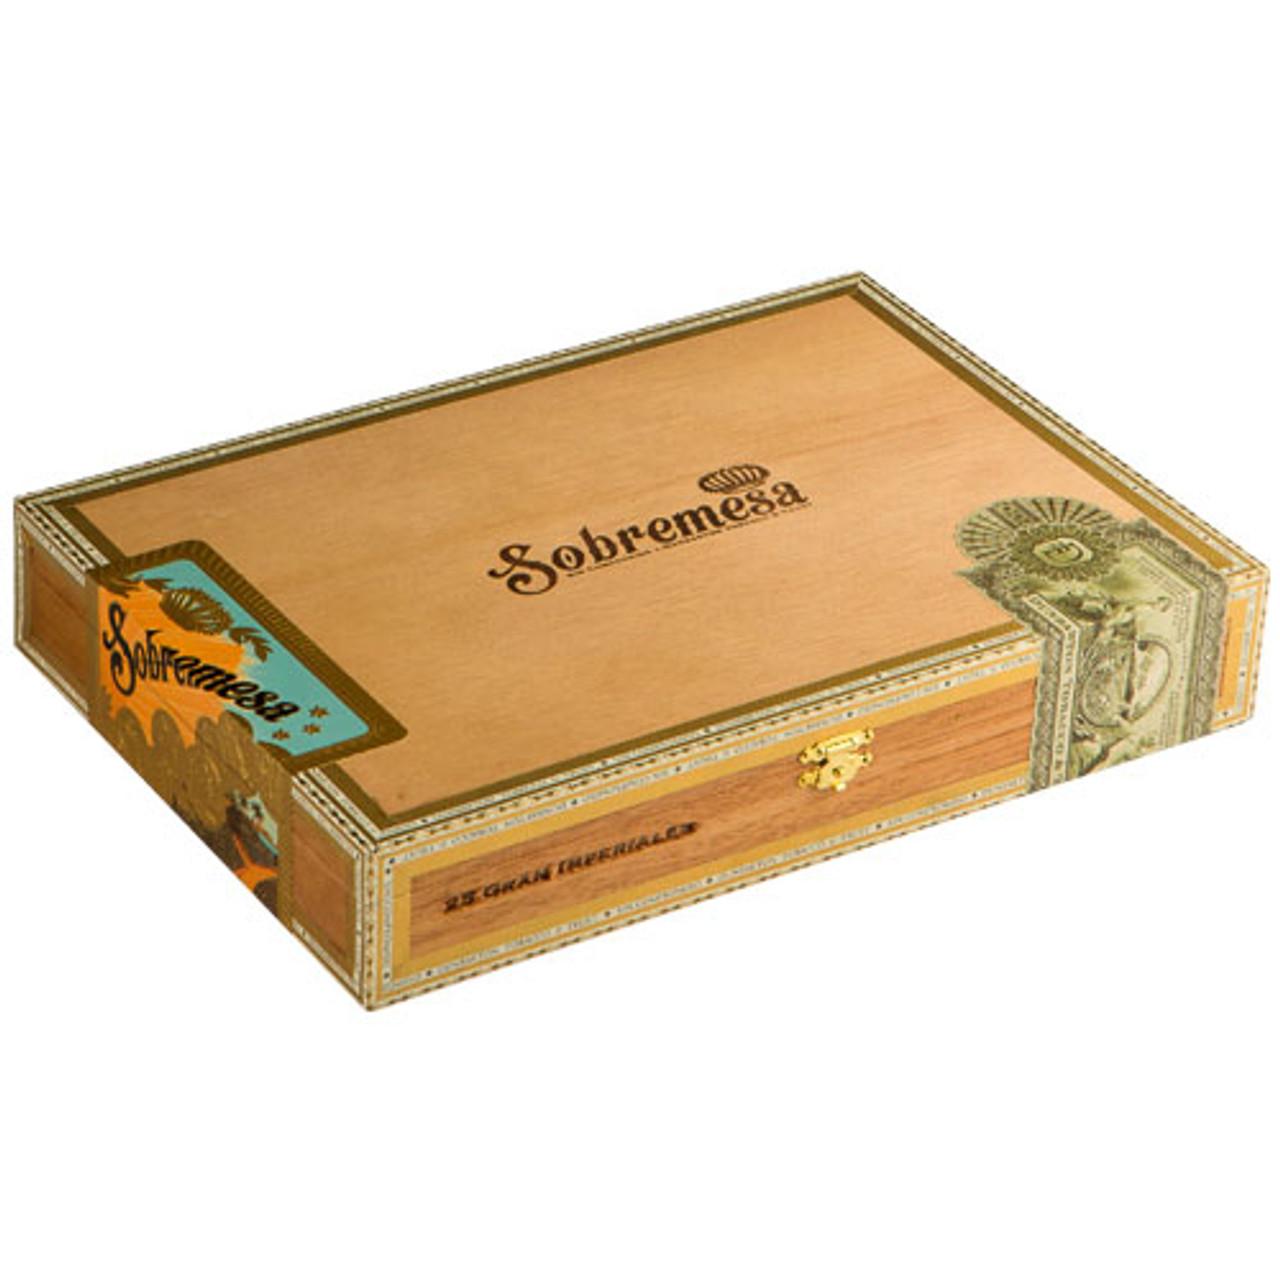 Sobremesa Corona Grande Cigars - 5.25 x 44 (Box of 25)